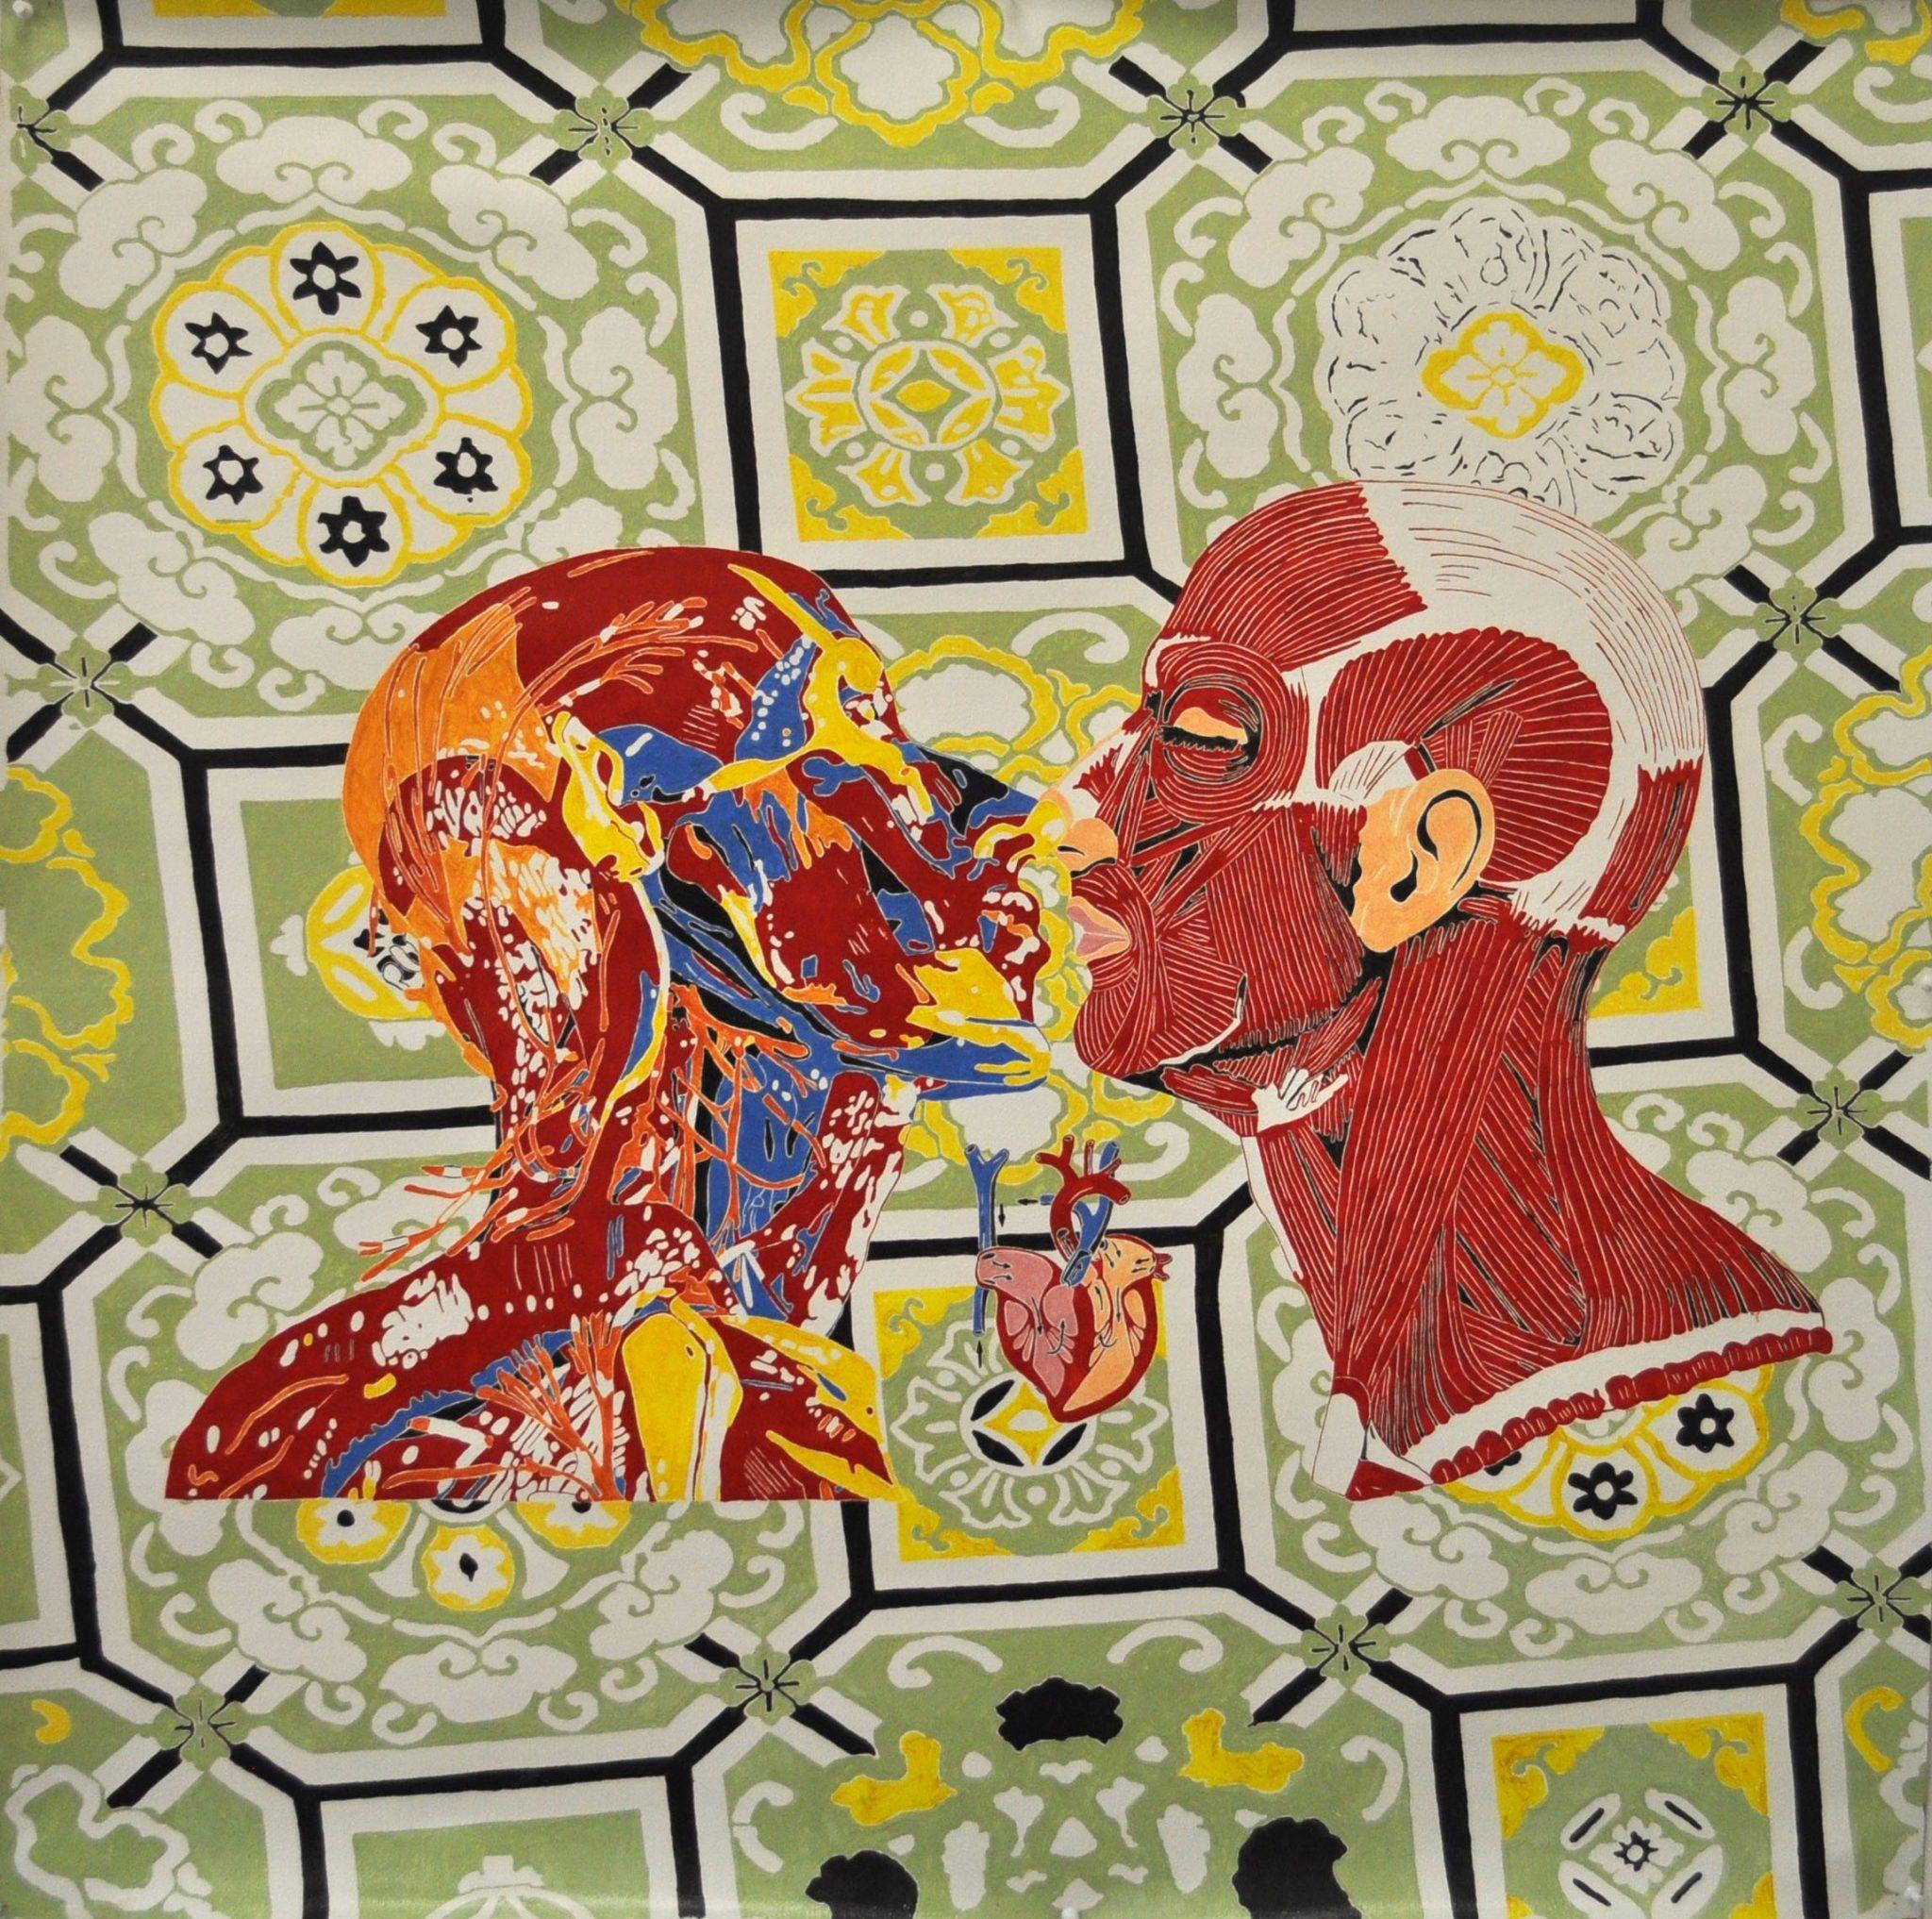 Maurizio Cannavacciuolo, I love you, 2014, olio su tela, 110 x 110 cm galleria Bonelli Milano